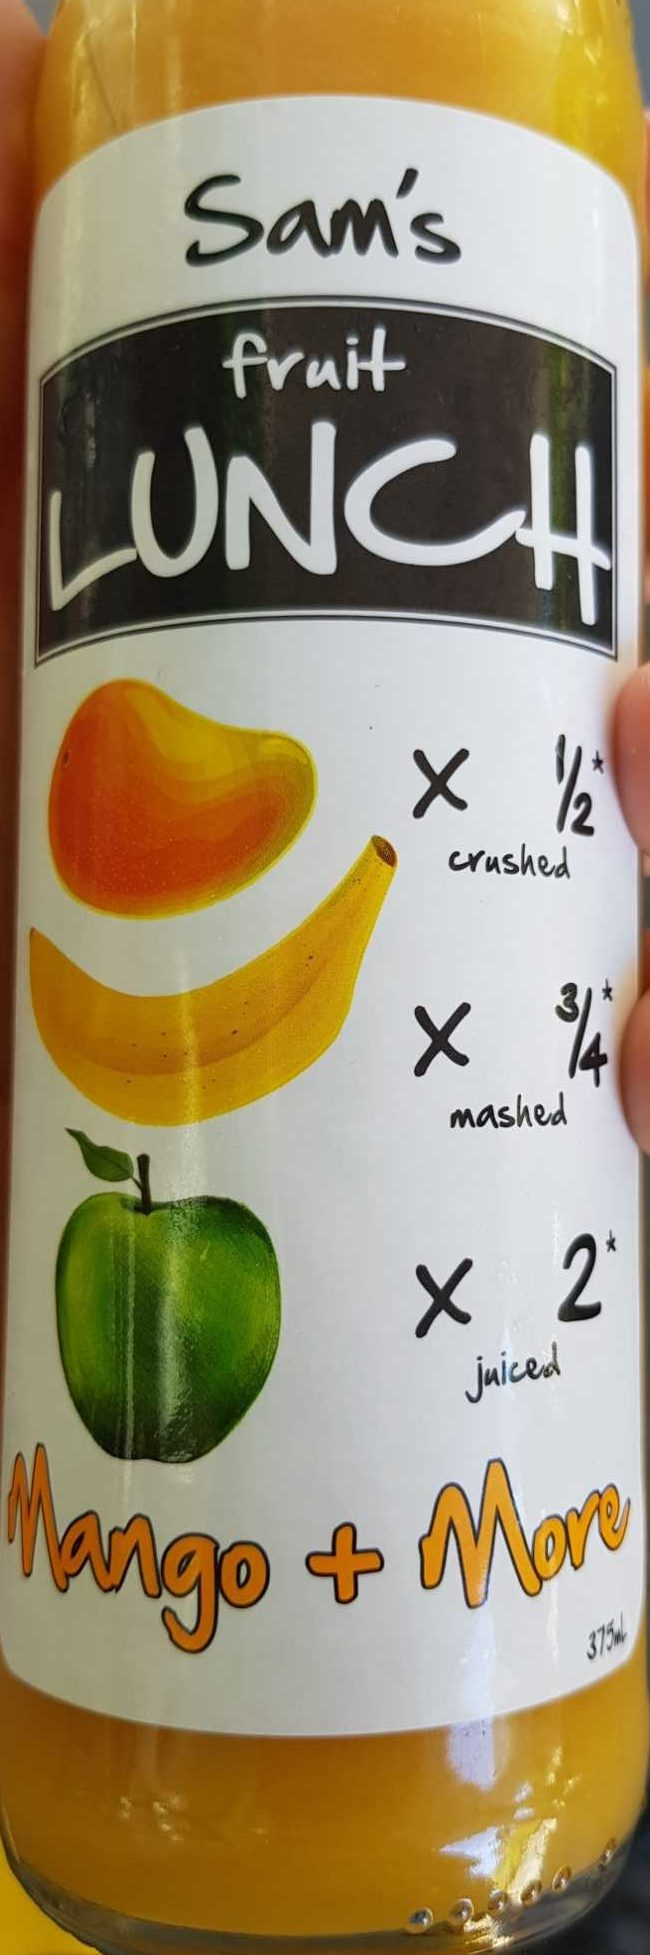 Sam's Fruit Lunch Mango + more - Product